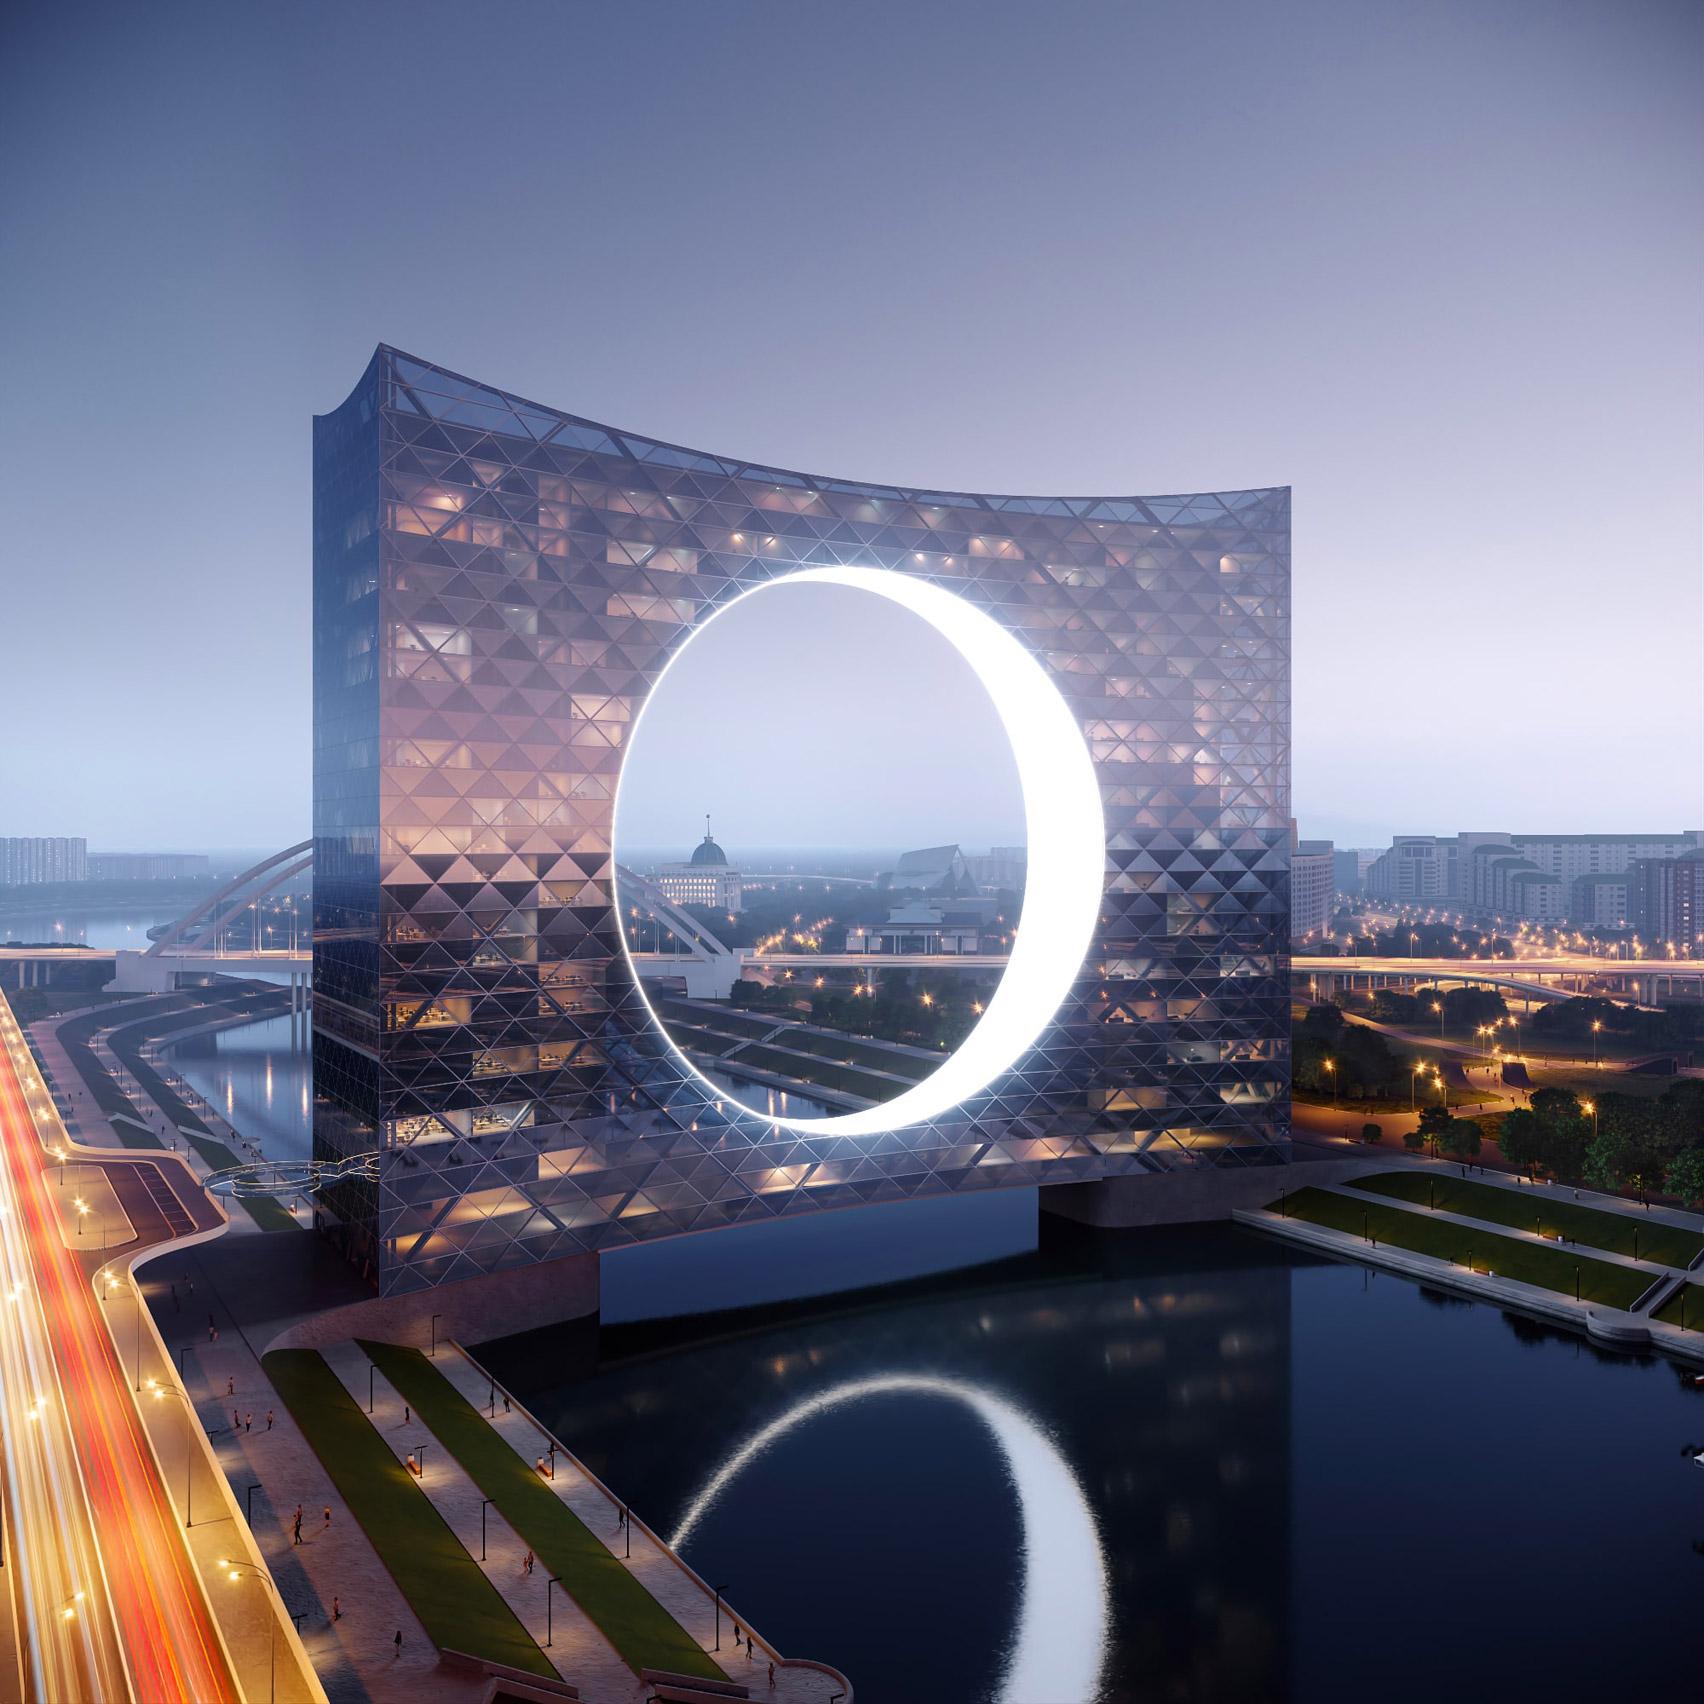 fundamental-architects-omega-render-astana-kazakhstan-flag_dezeen_1704_col_2